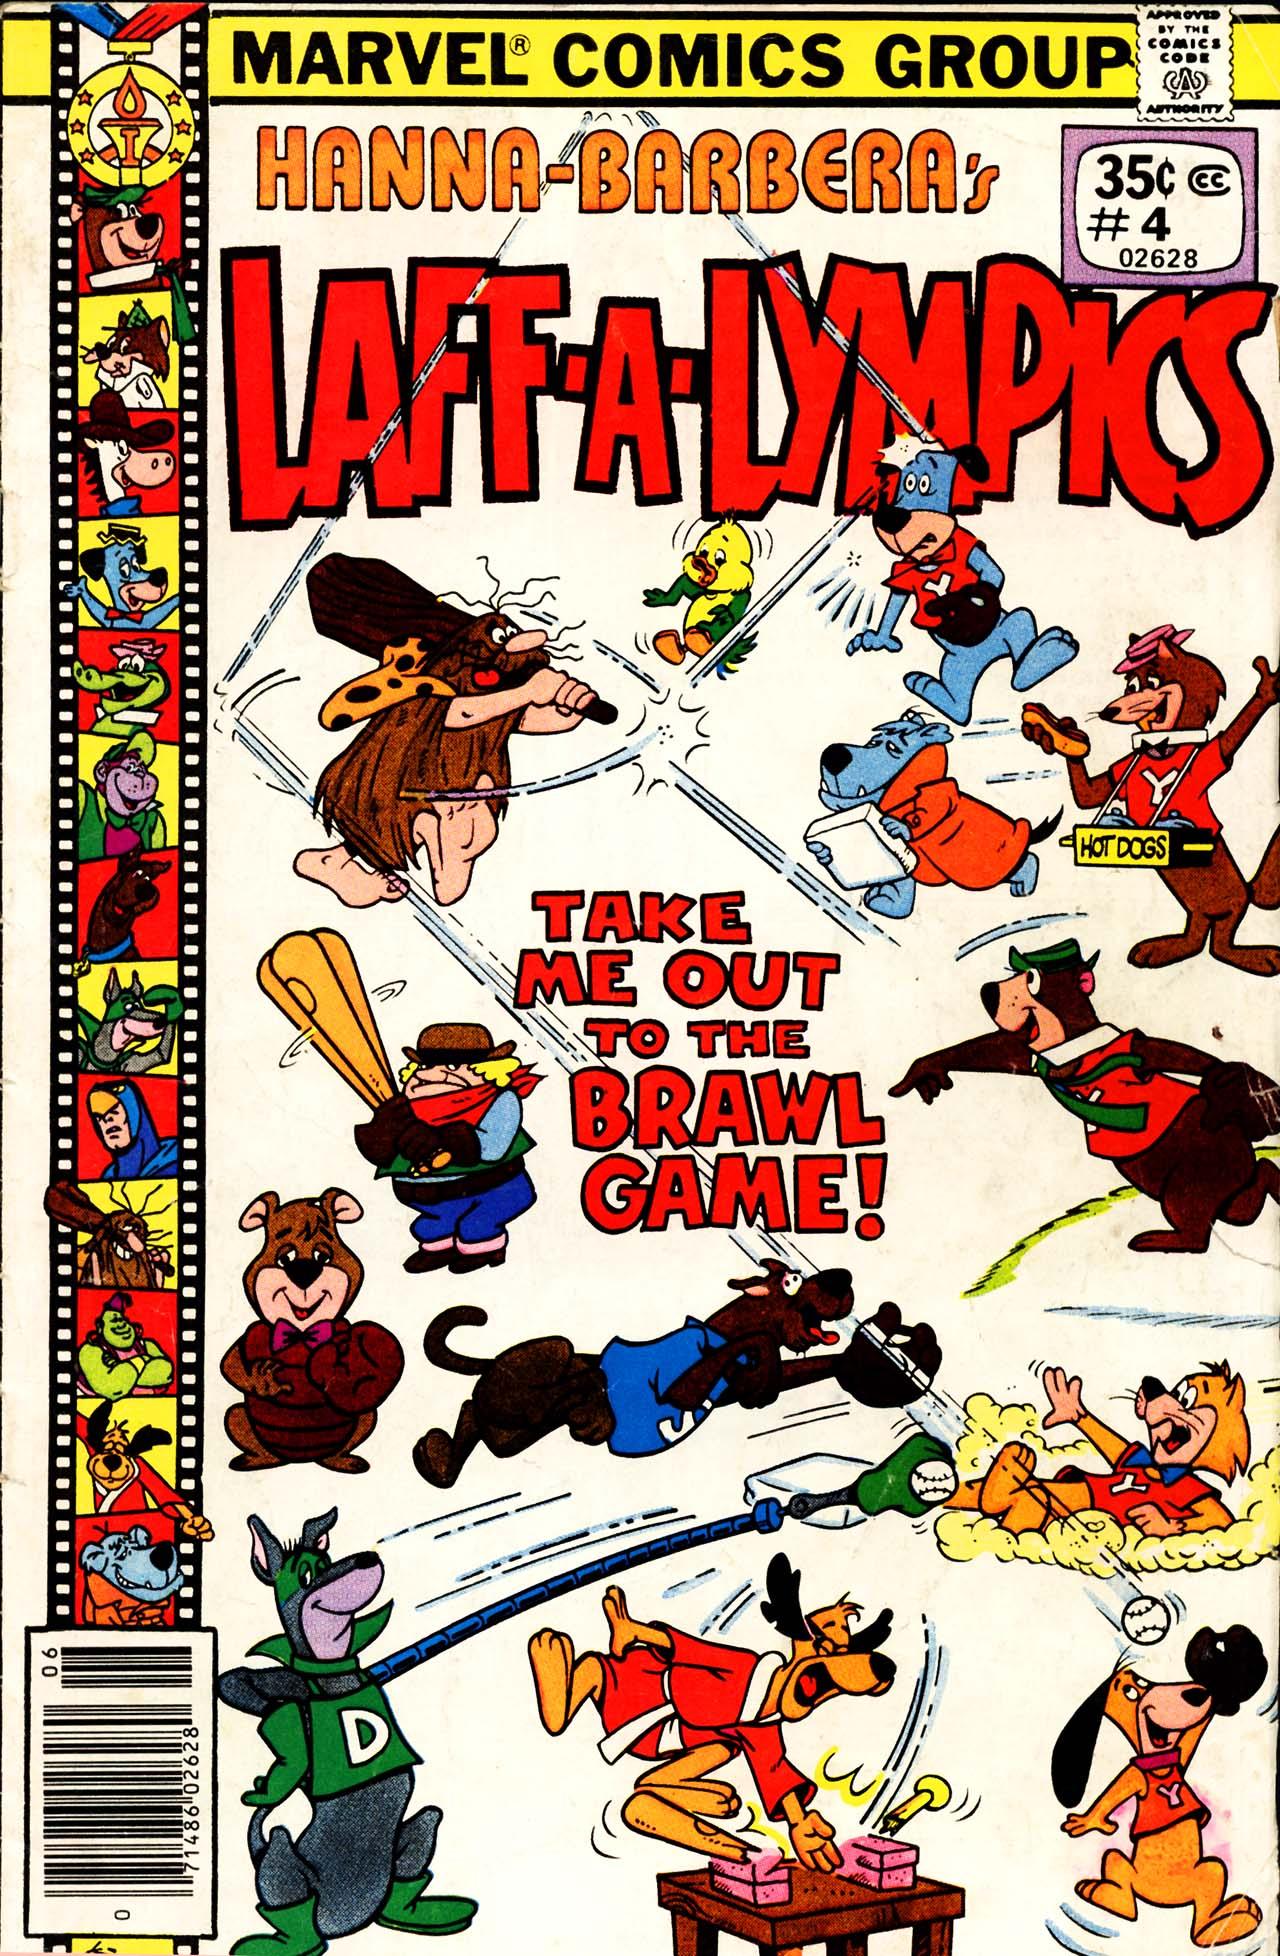 Laff-a-lympics 4 Page 1